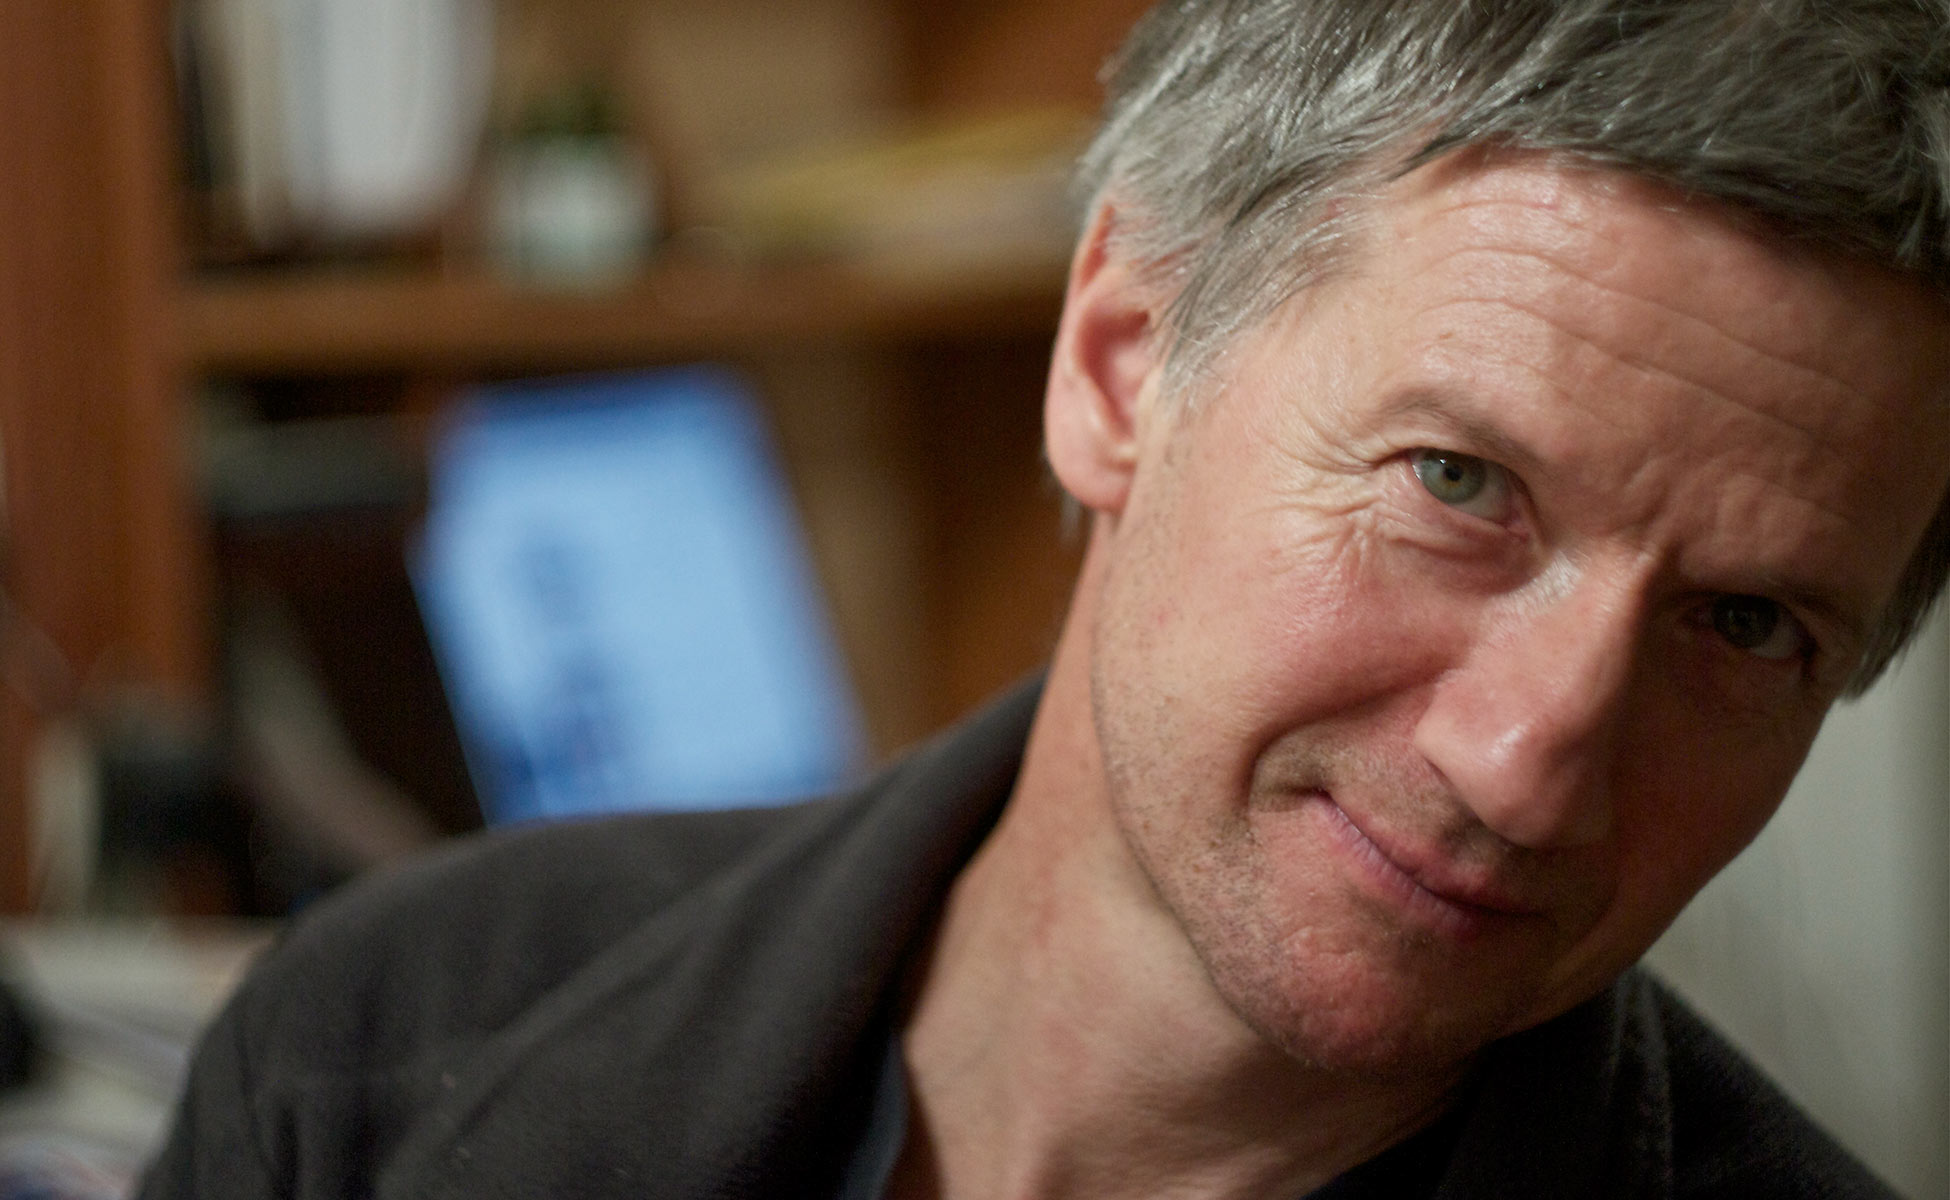 Richard Jussel